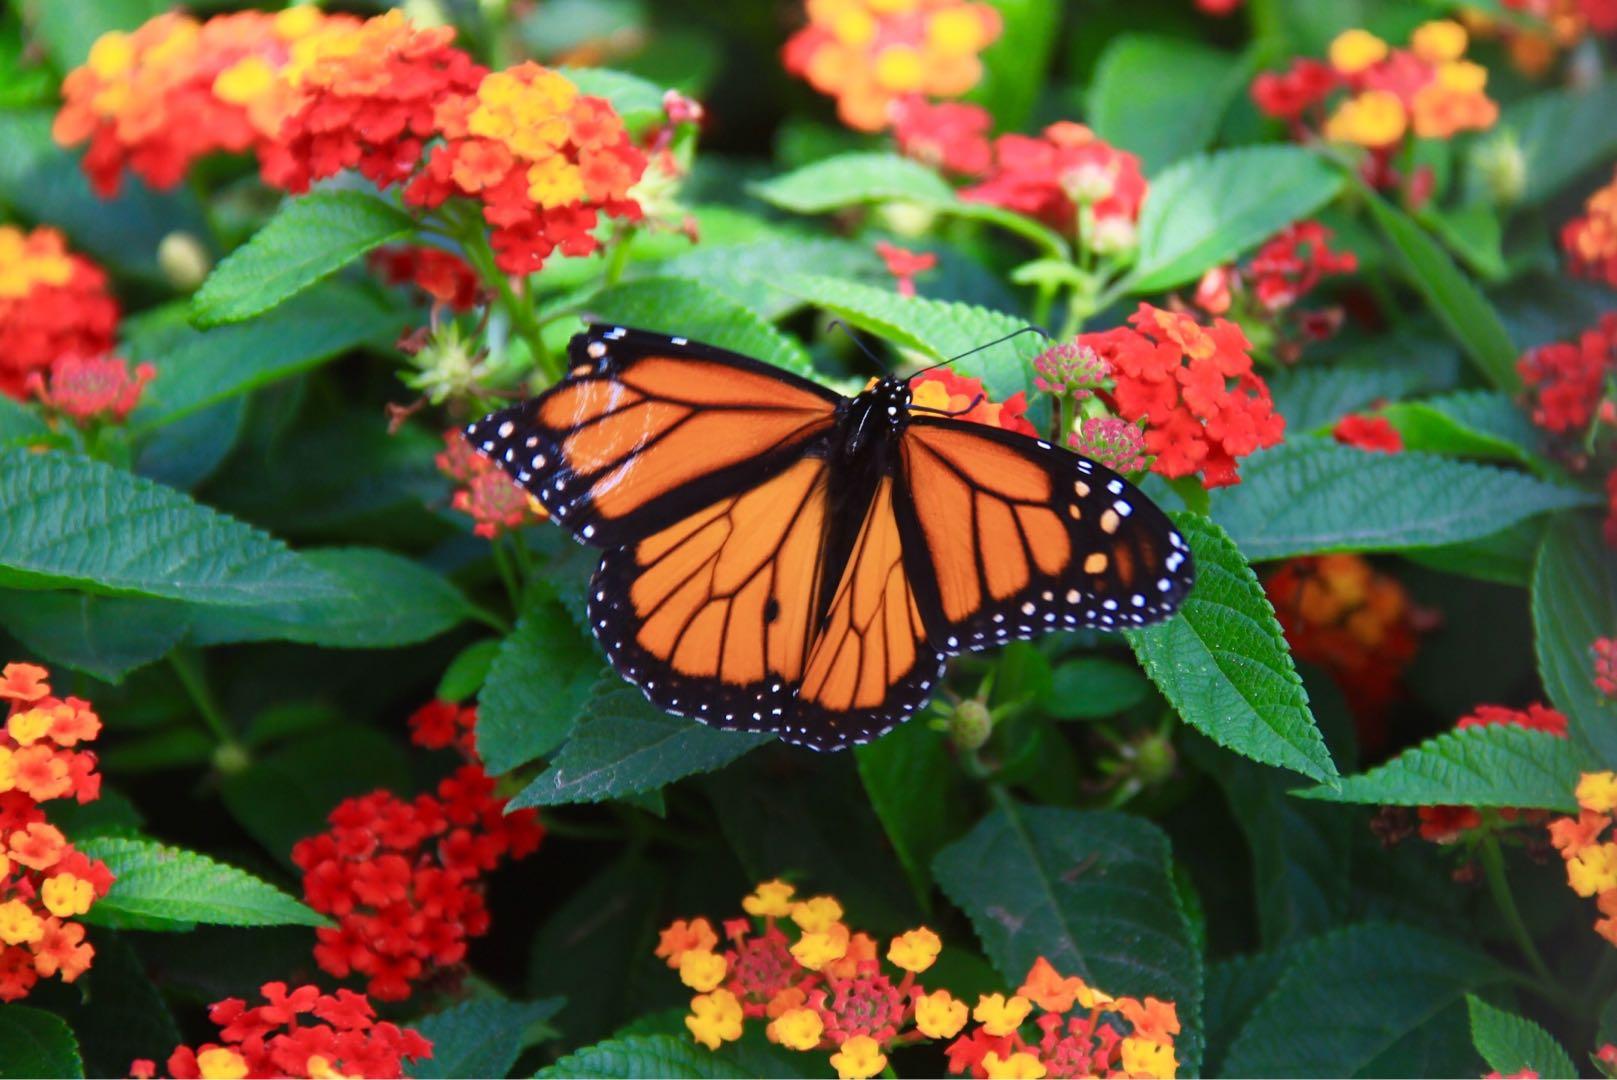 Butterfly; Sharon Zhou